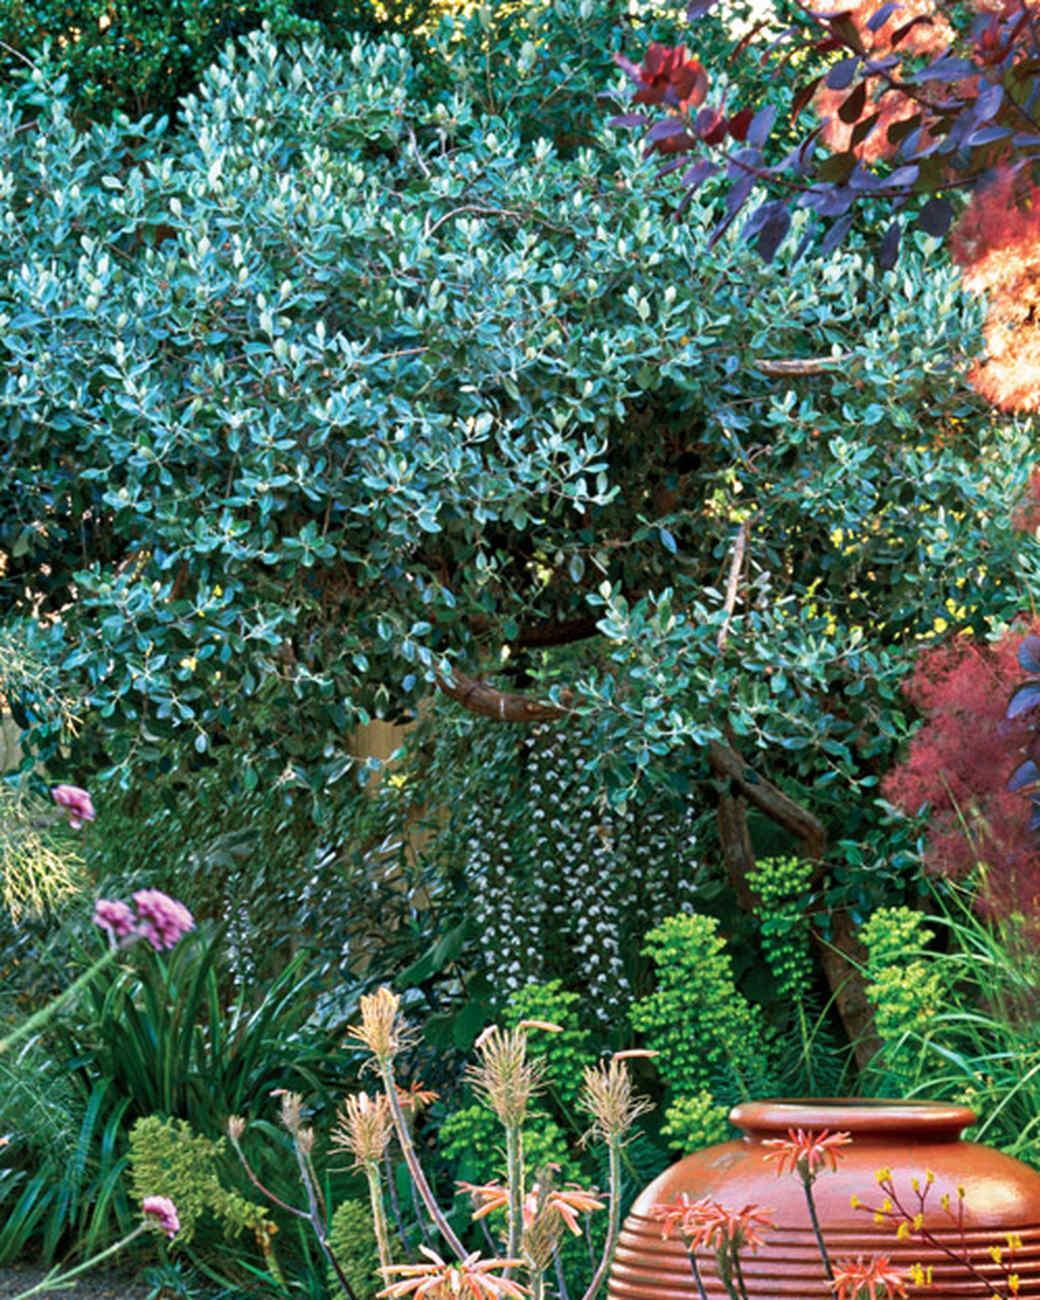 mla10490_0809_pineappl_guava.jpg